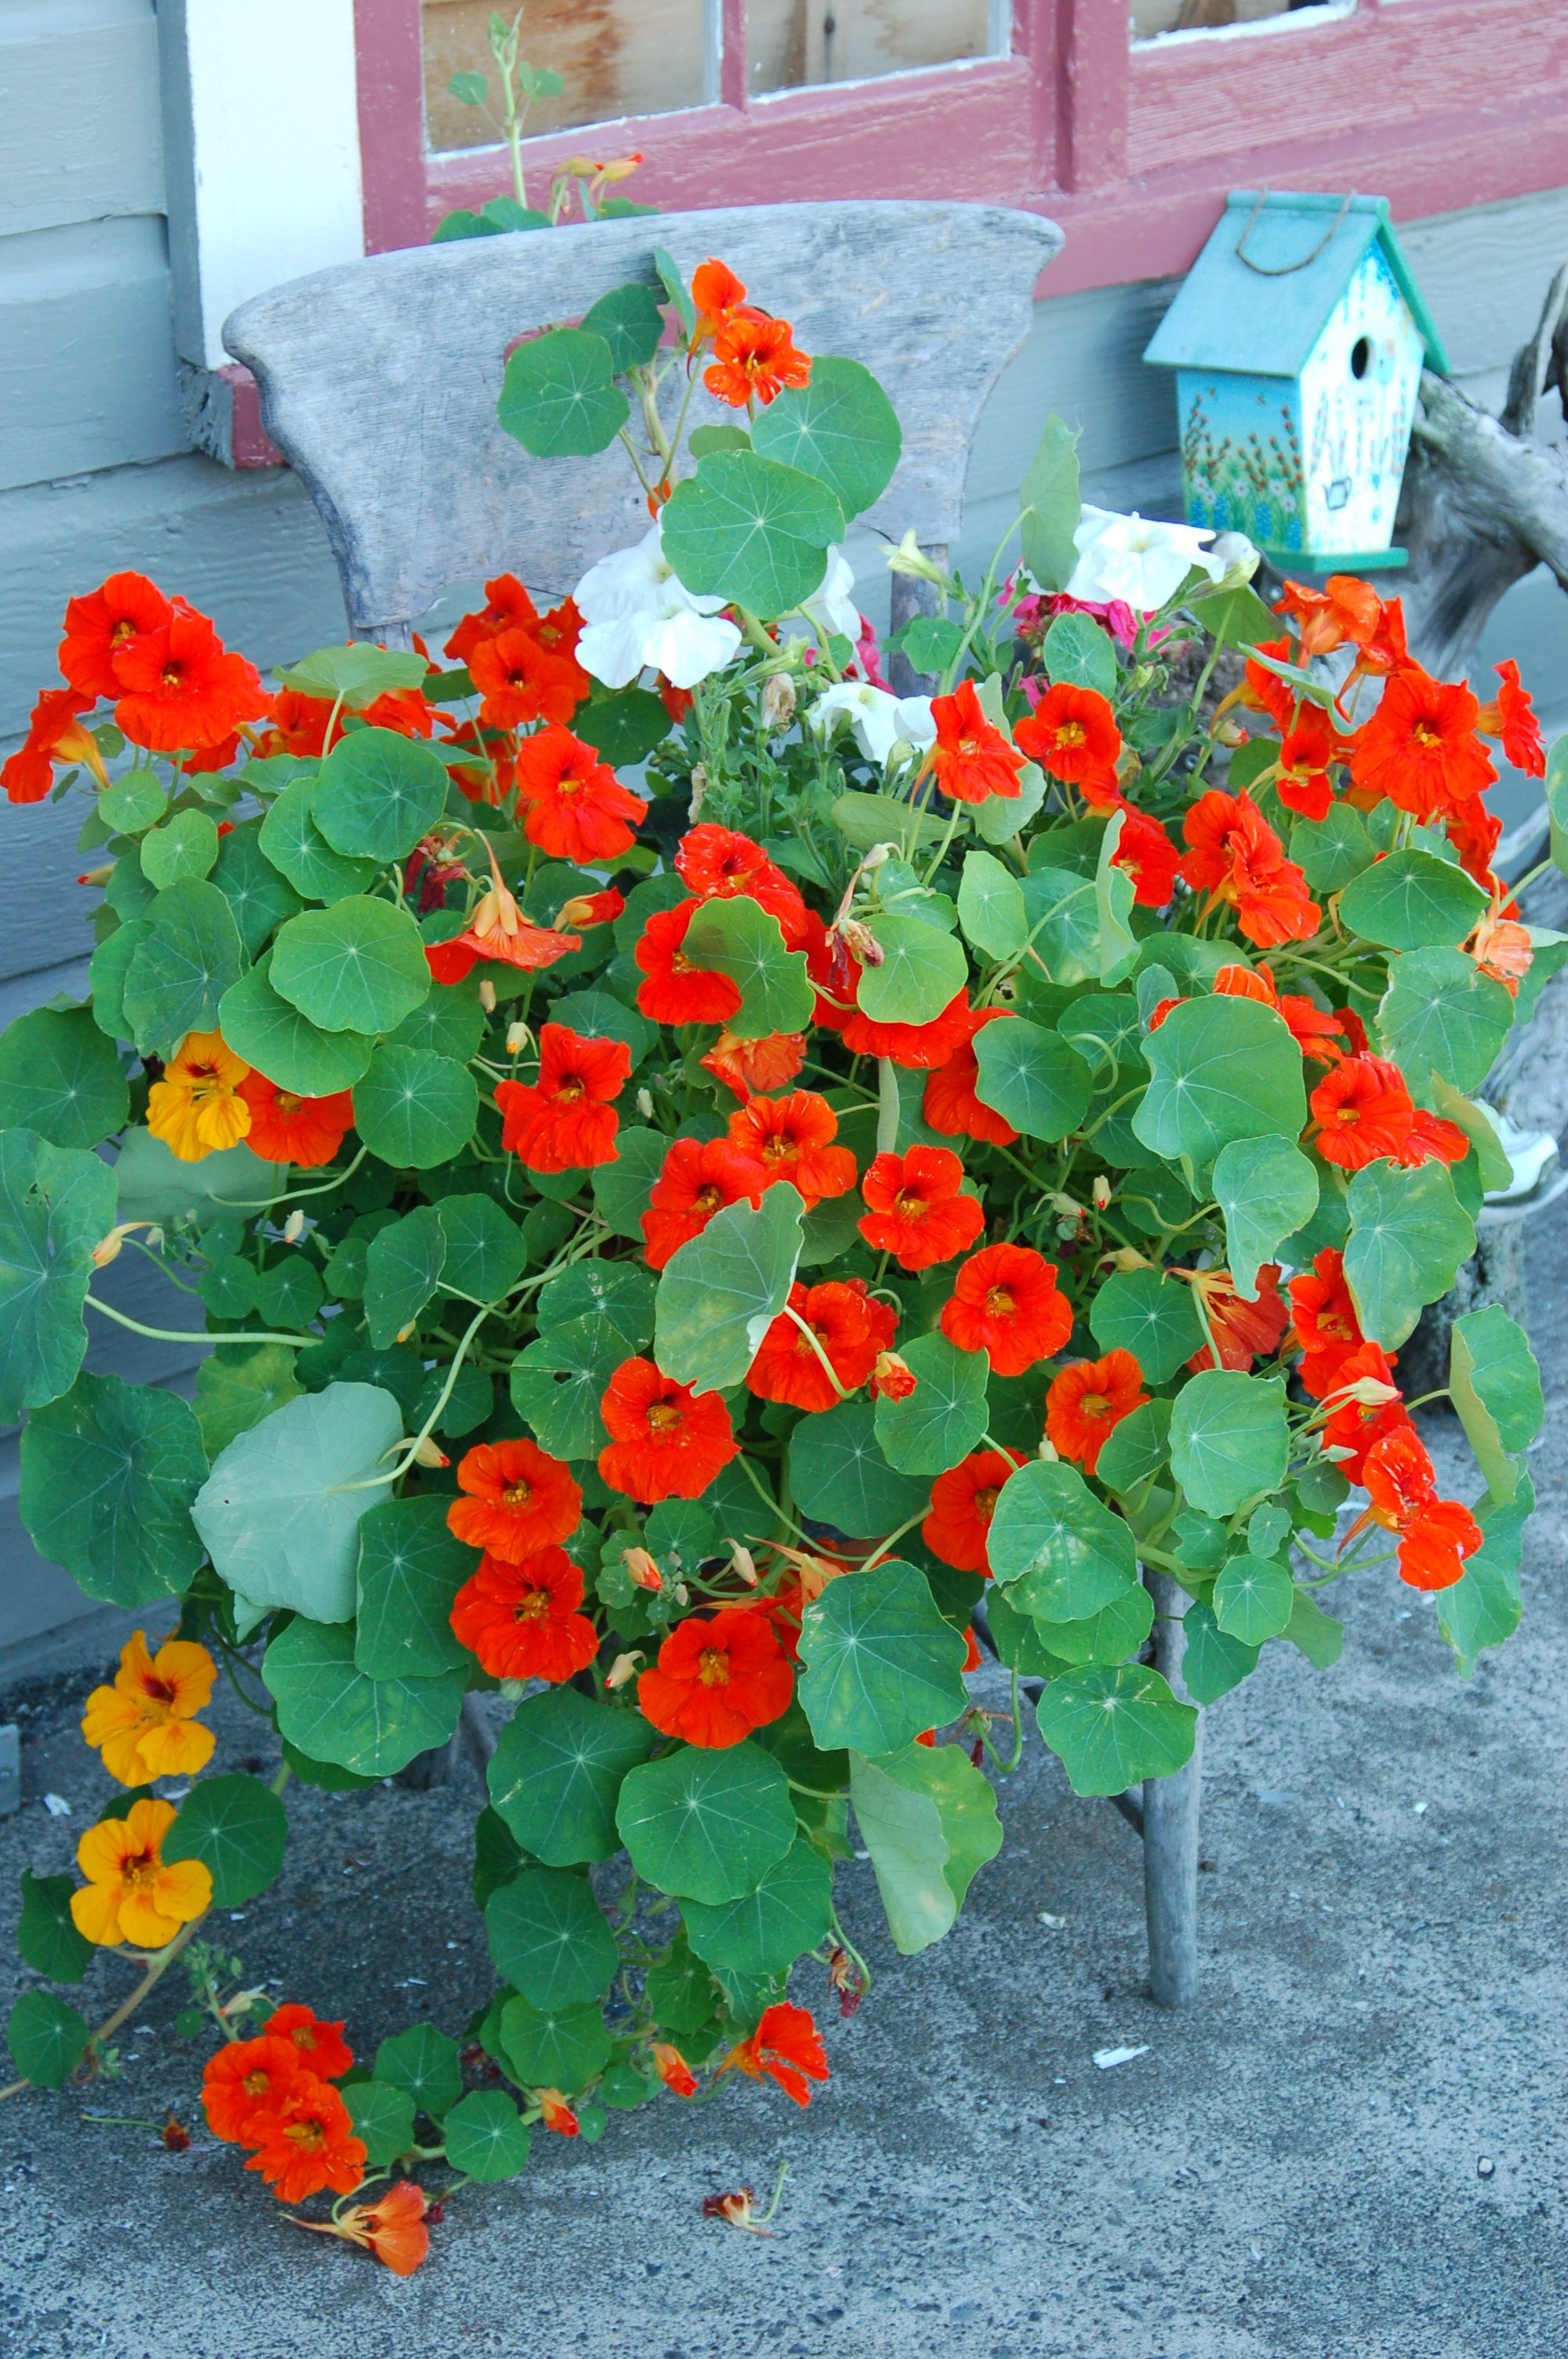 Love Nasturtiums in my garden...http://www.aldenteblog.com/2012/03/edible-flowers-for-the-salad-bowl.html